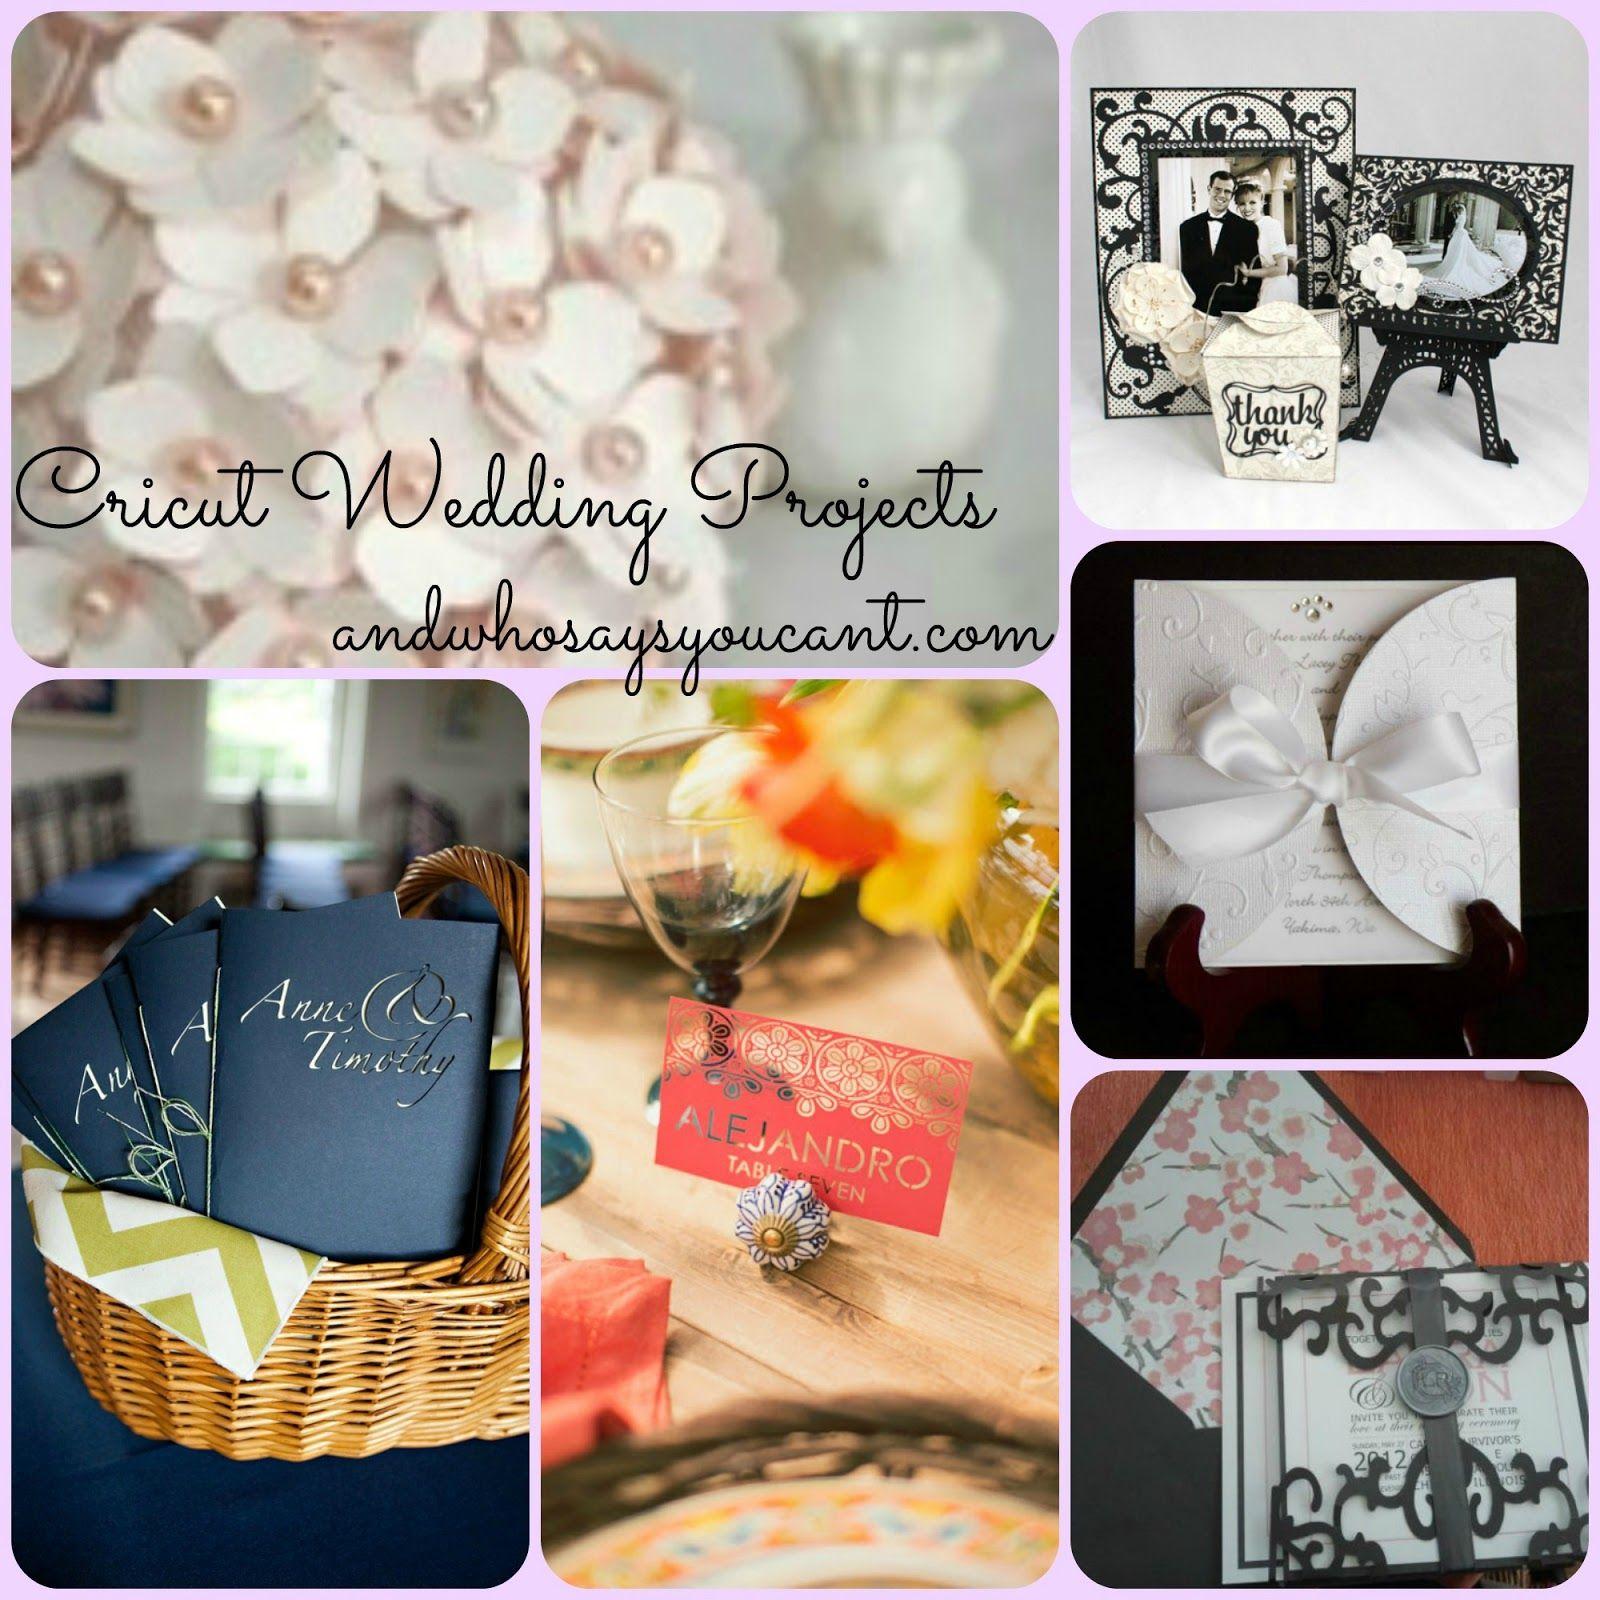 DIY WEDDING PROJECTS WITH YOUR CRICUT Cricut wedding